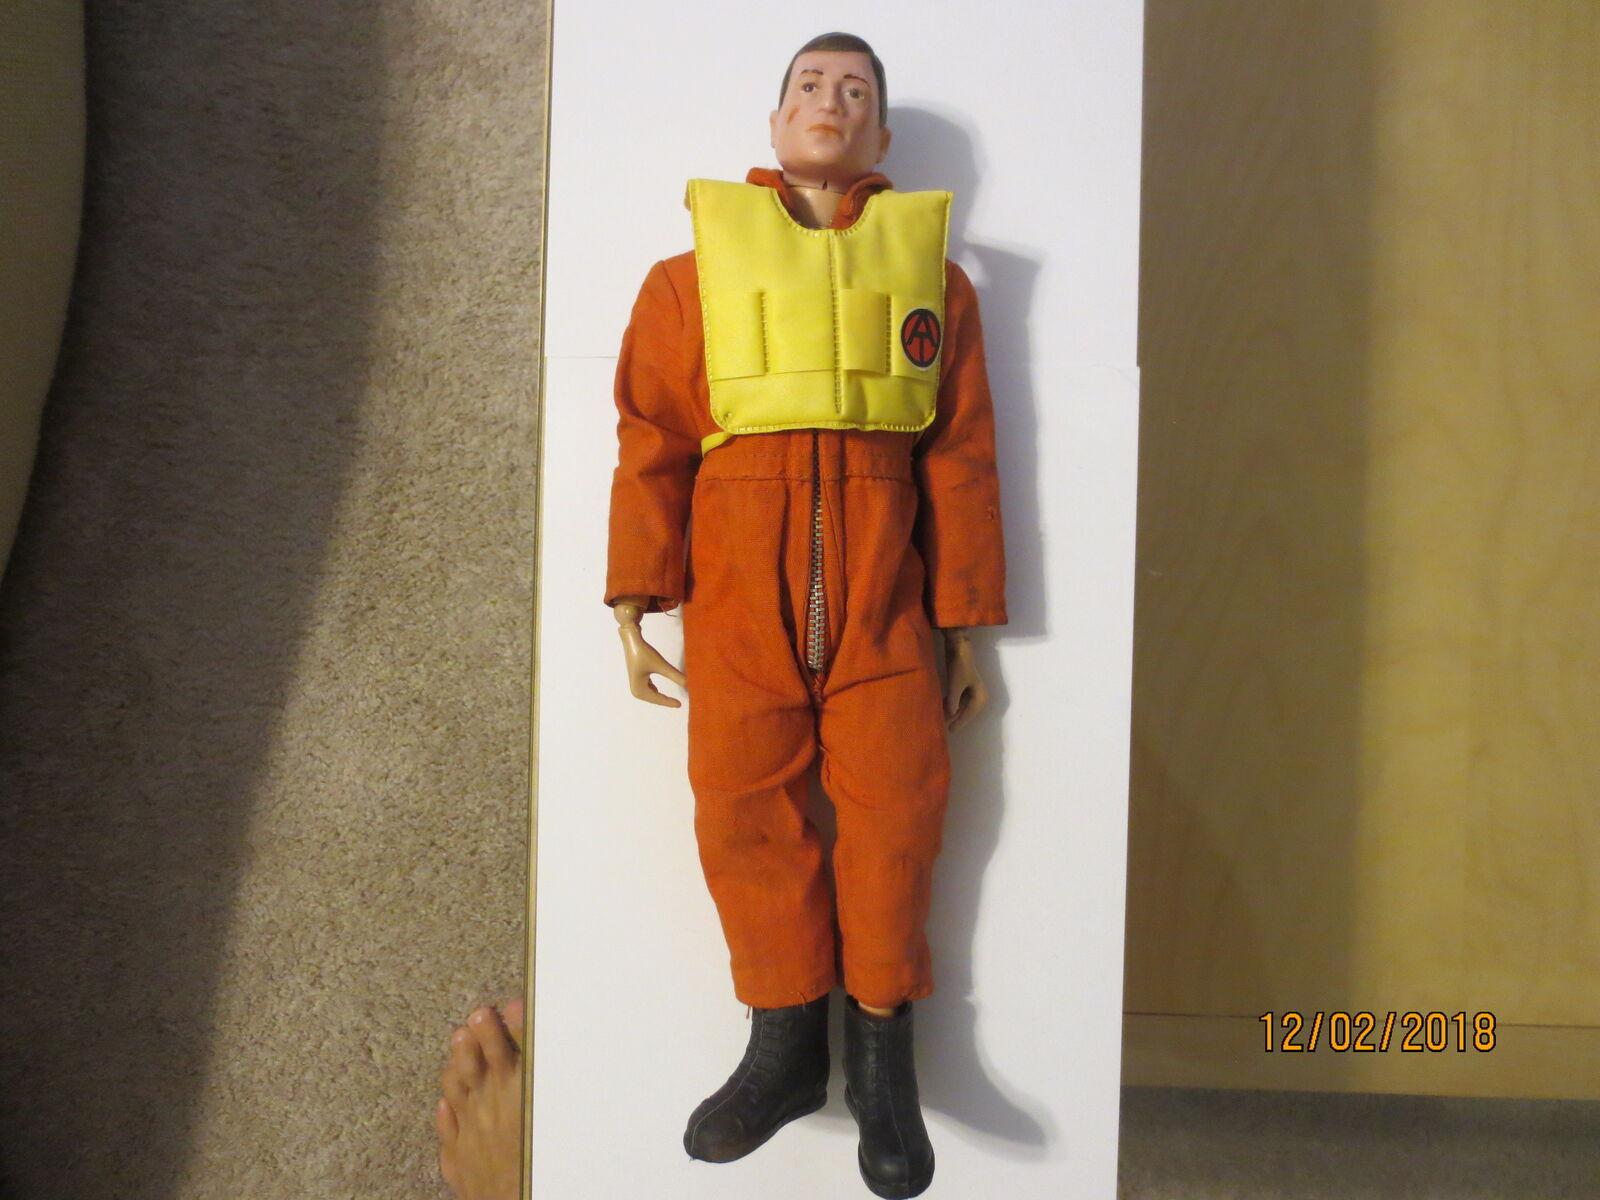 Rare Original Original Original 1964 GI JOE Fighter pilot figure w orange jumpsuit and life vest b5fecd